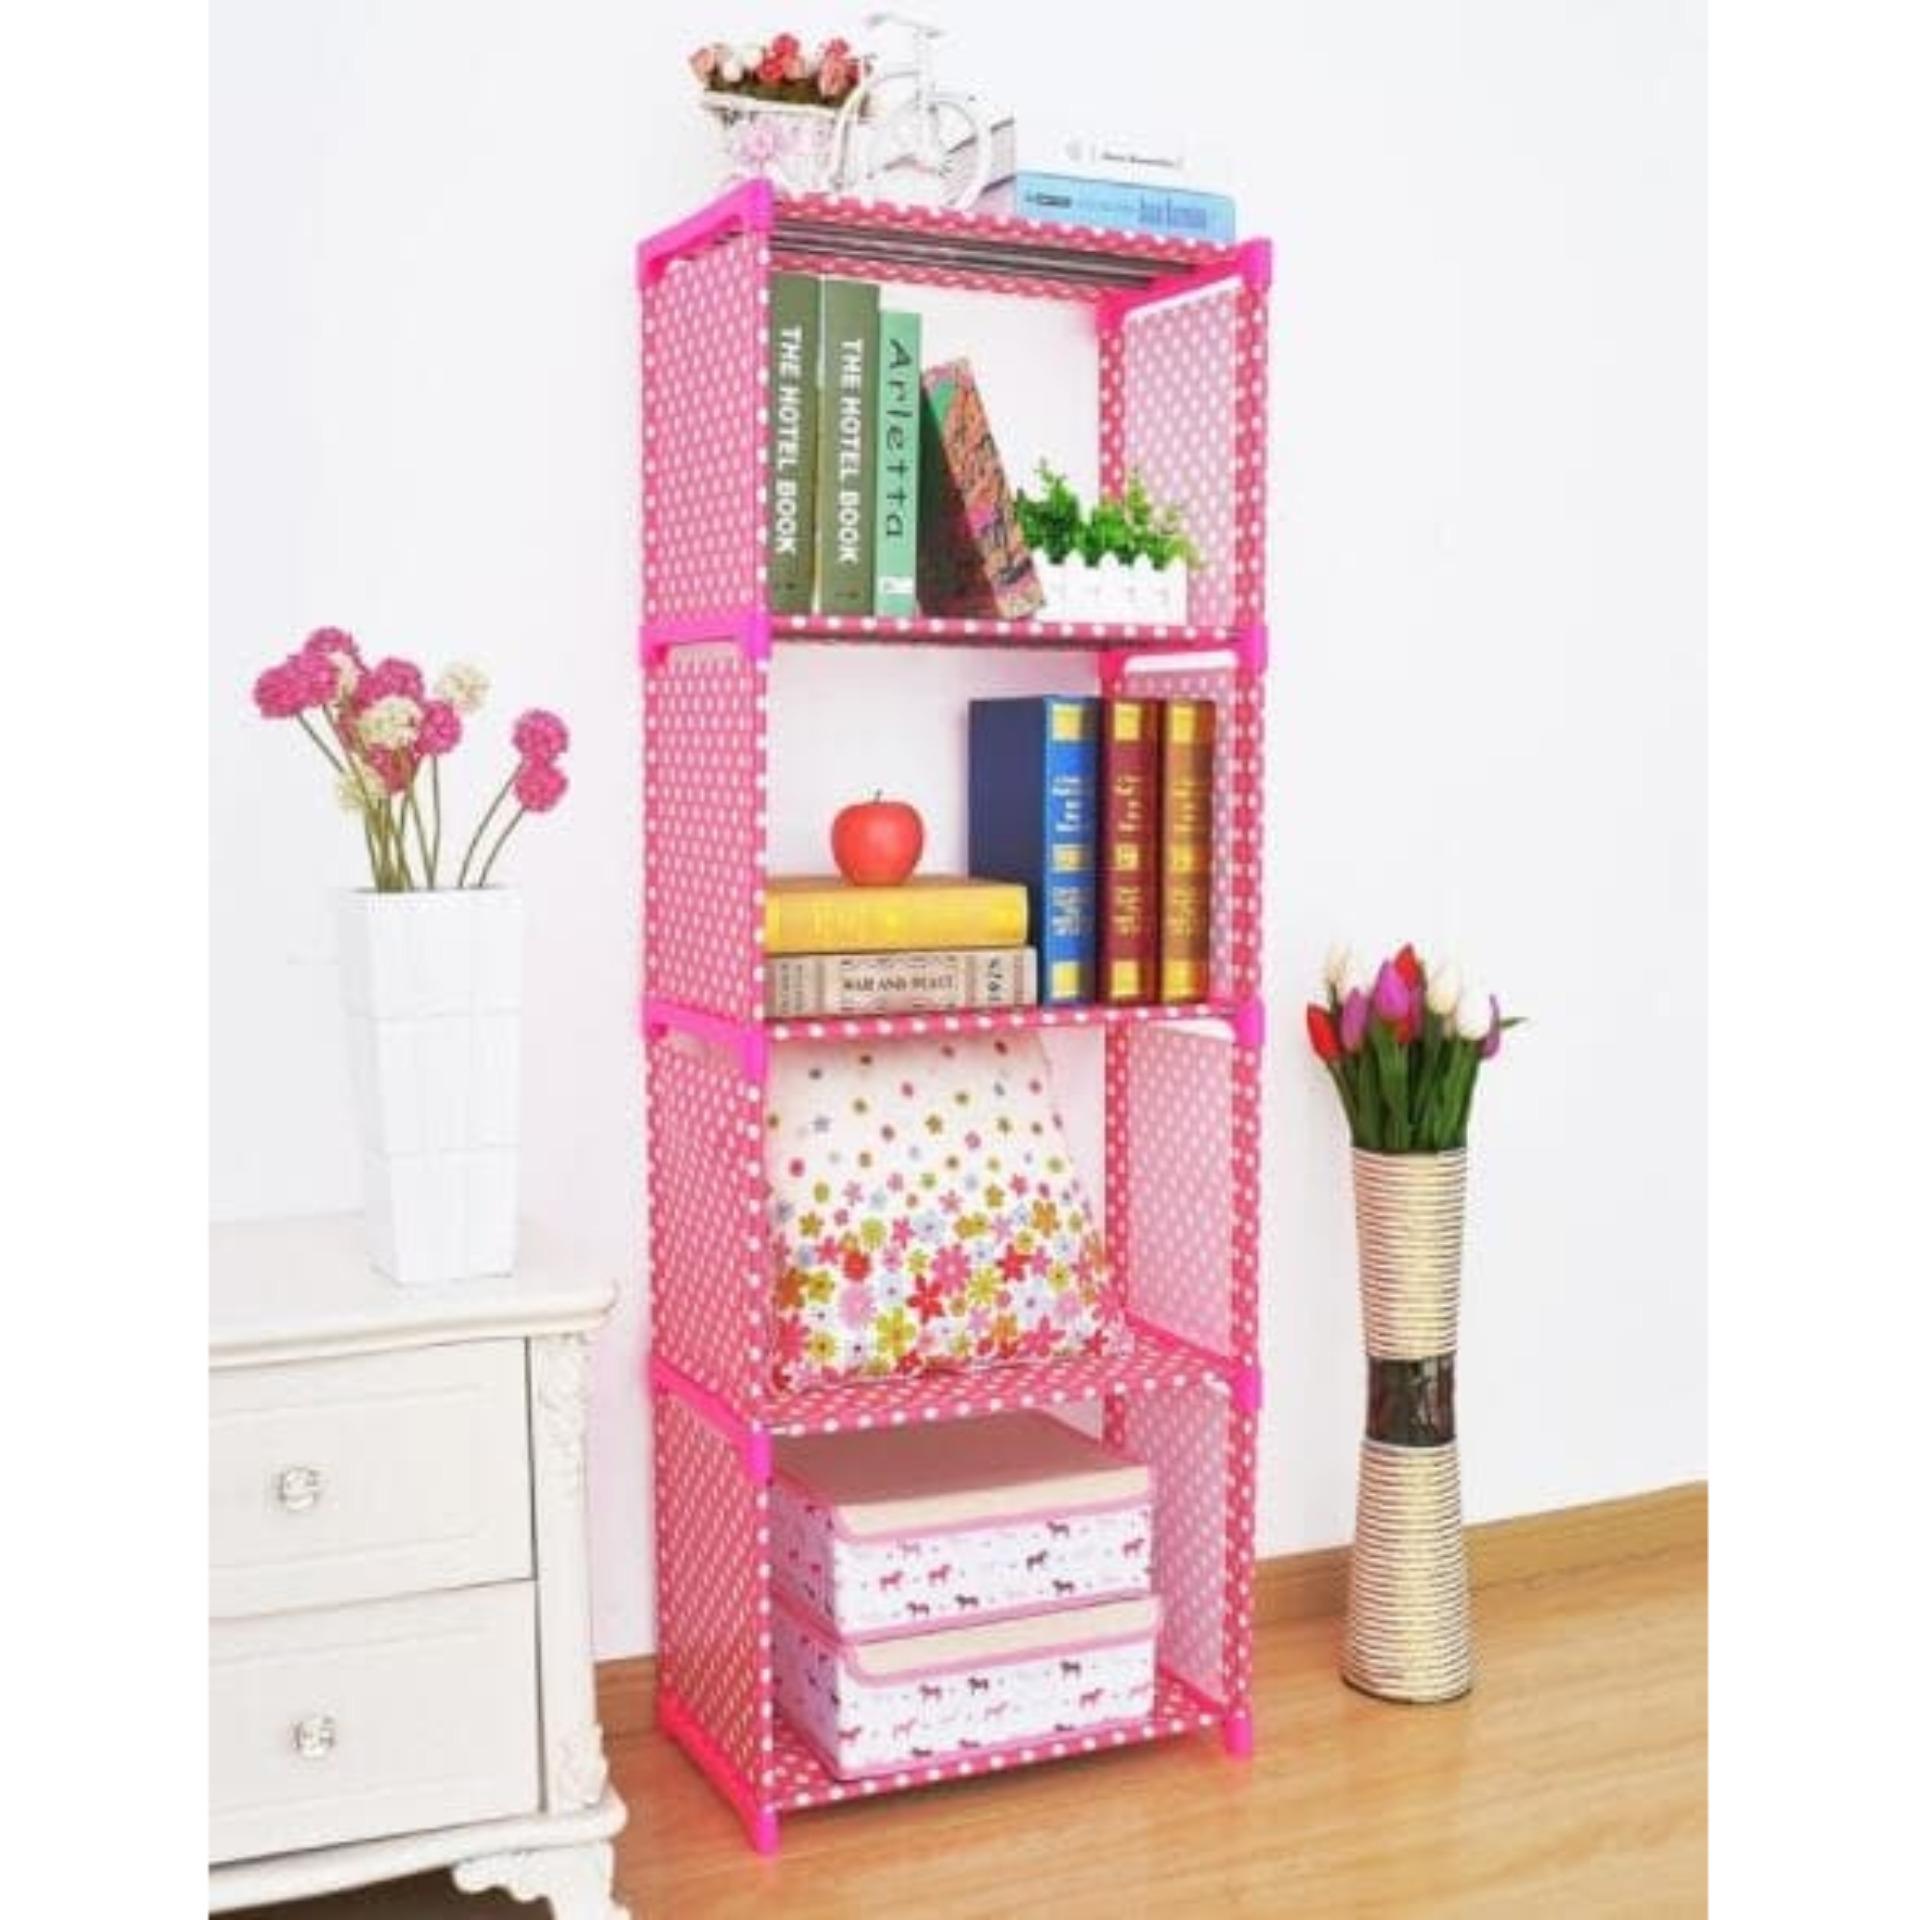 Rak Portable Serbaguna 5 Susun 4 Ruang Pink Polkadot Rak Buku Diskon